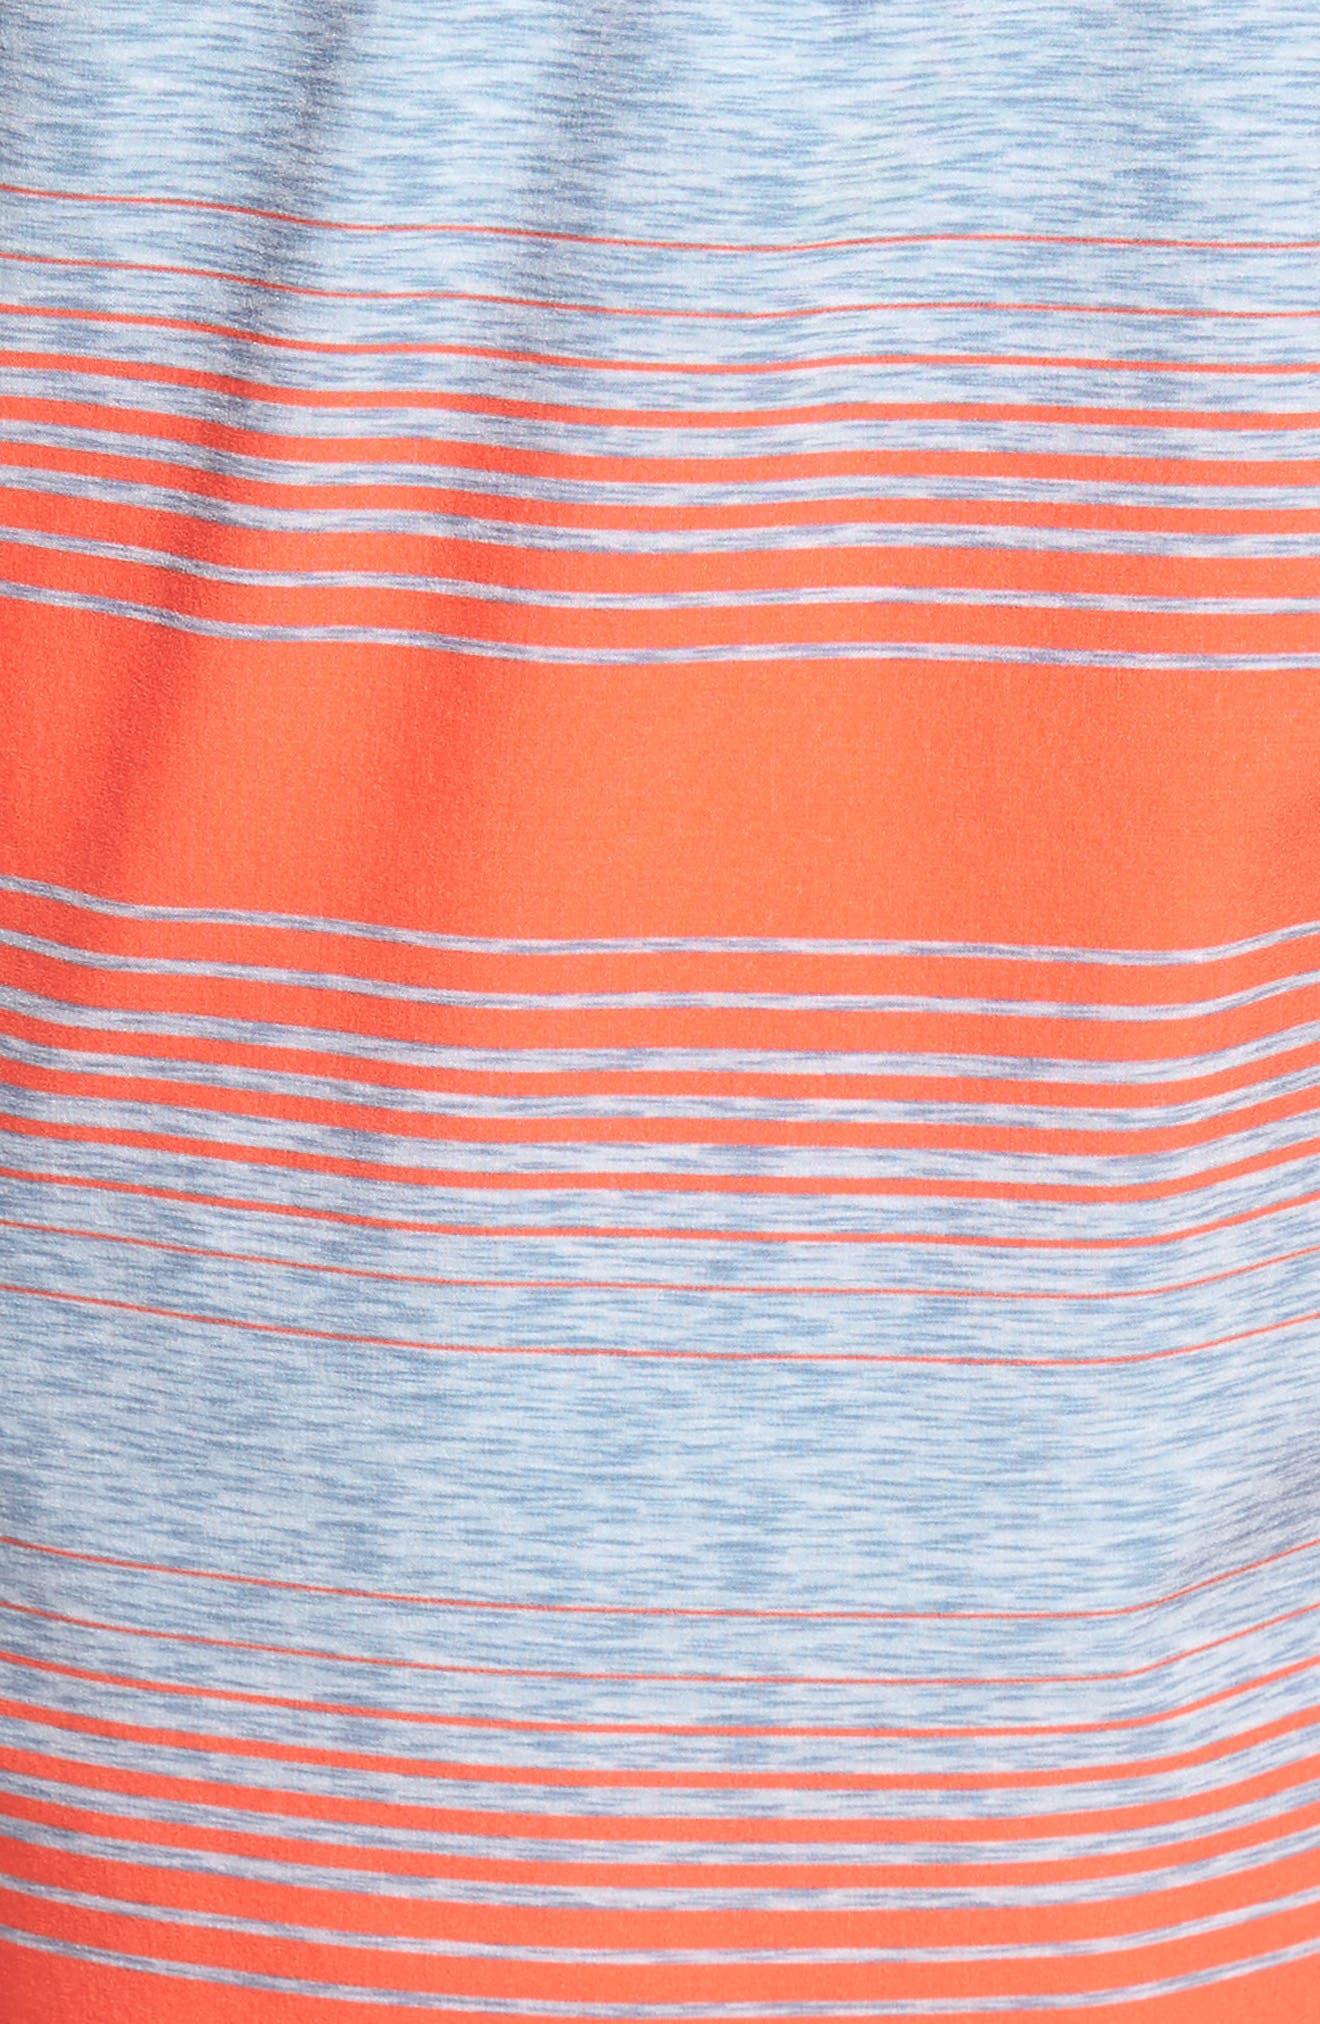 Stripe Swim Trunks,                             Alternate thumbnail 5, color,                             Hot Coral